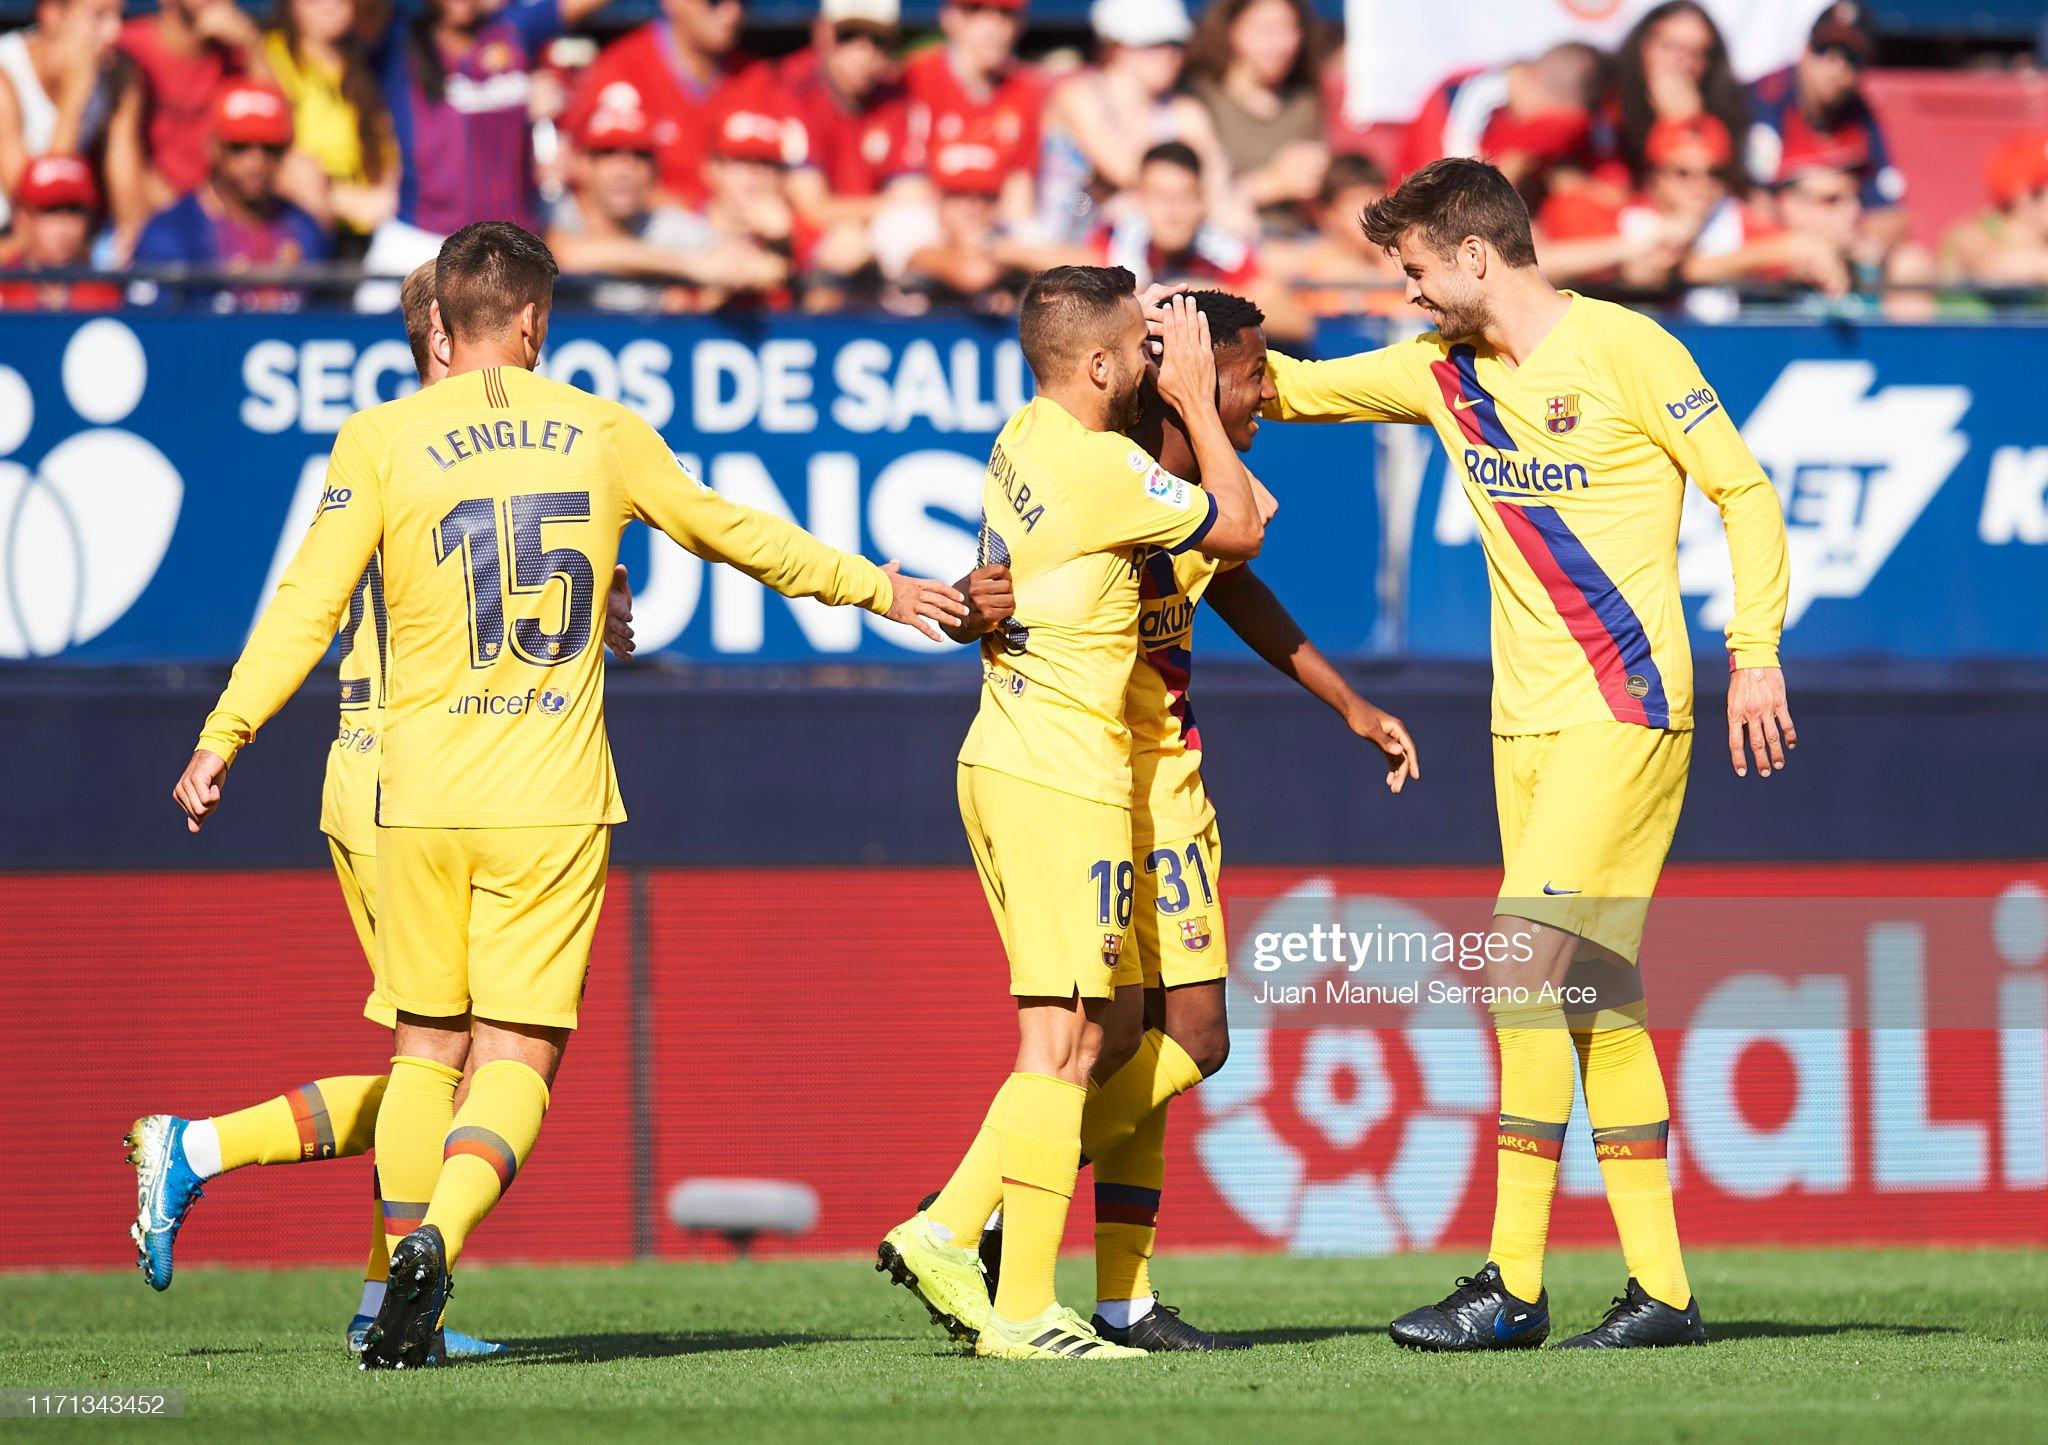 صور مباراة : أوساسونا - برشلونة 2-2 ( 31-08-2019 )  Anssumane-fati-of-fc-barcelona-celebrates-with-teammates-jordi-alba-picture-id1171343452?s=2048x2048